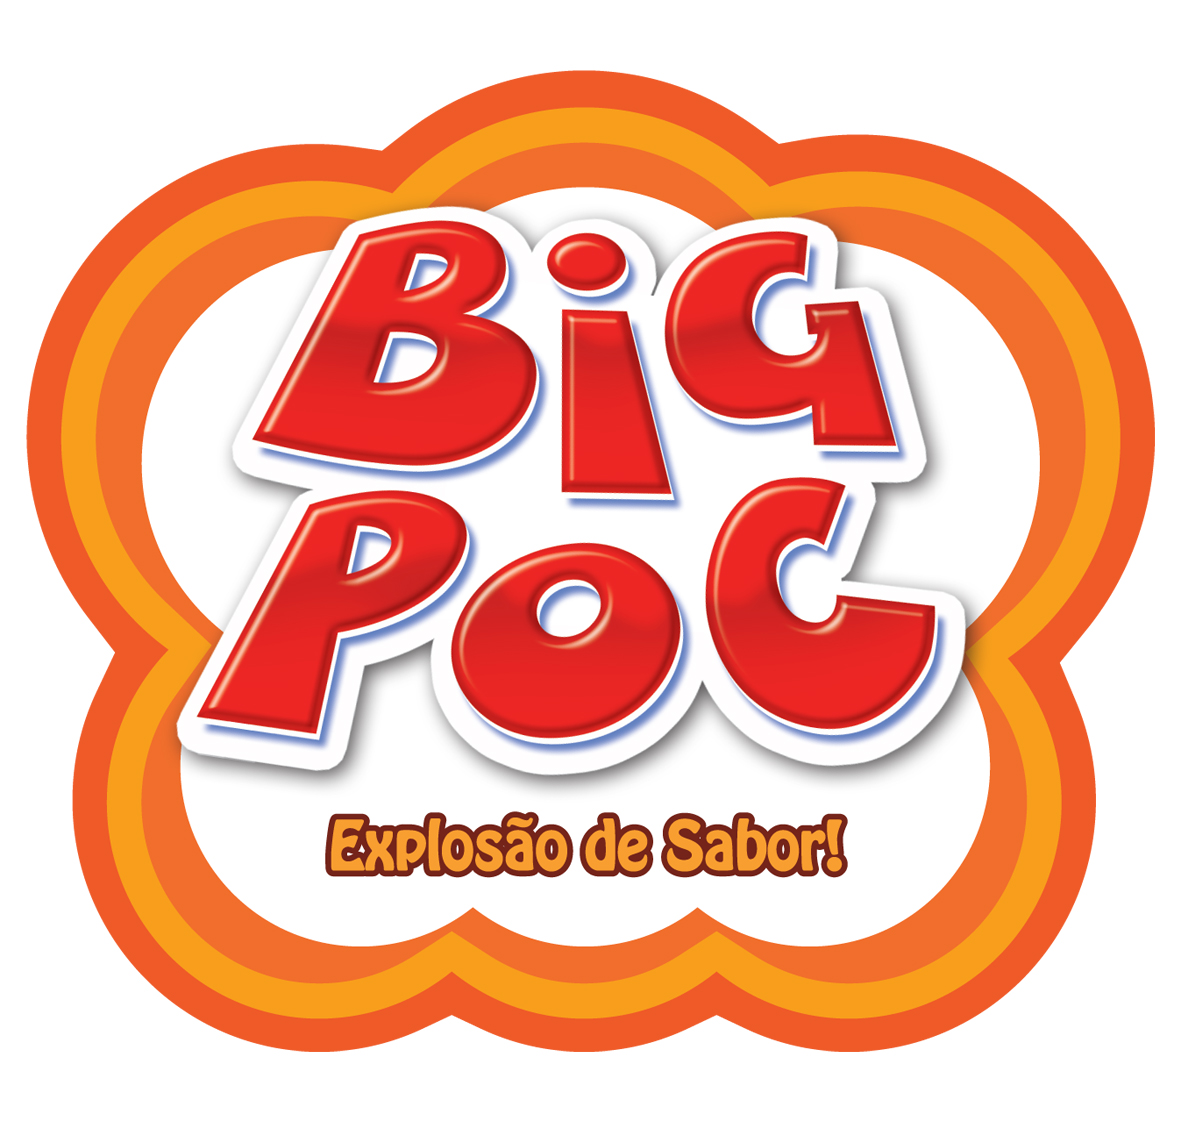 Big Poc anuncia estande na Expocine19